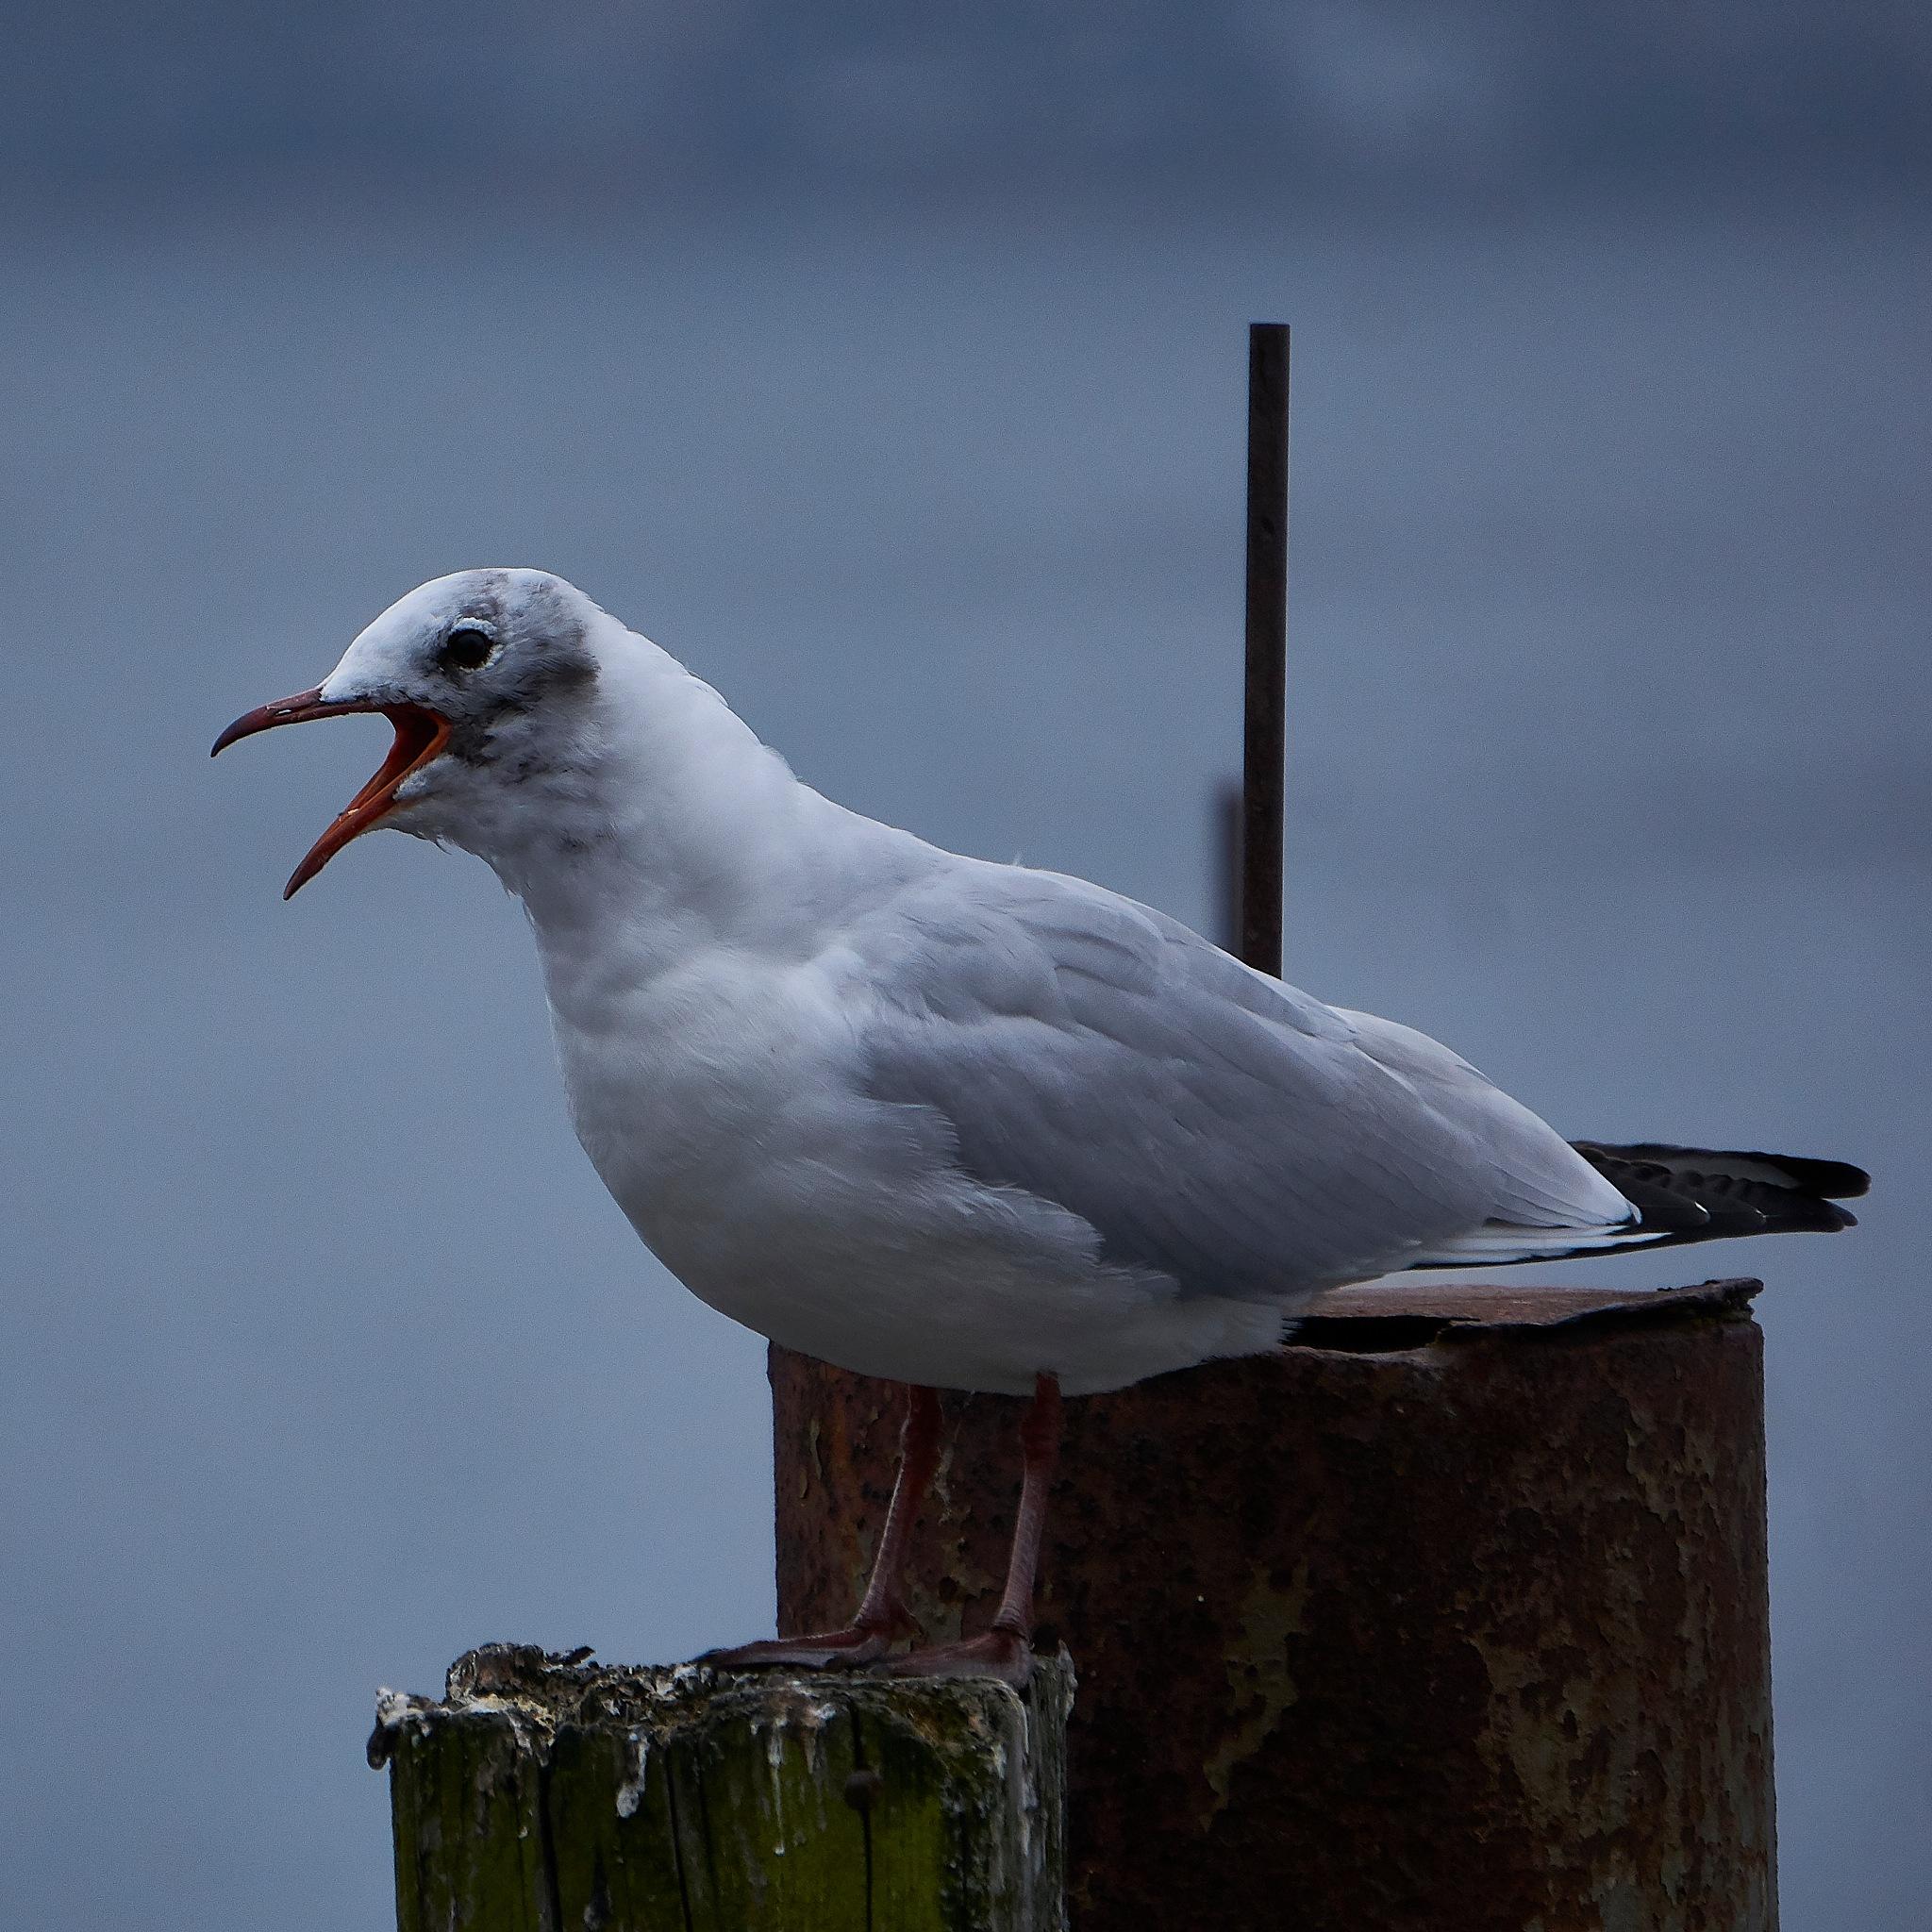 Screaming Gull by Peter Buck